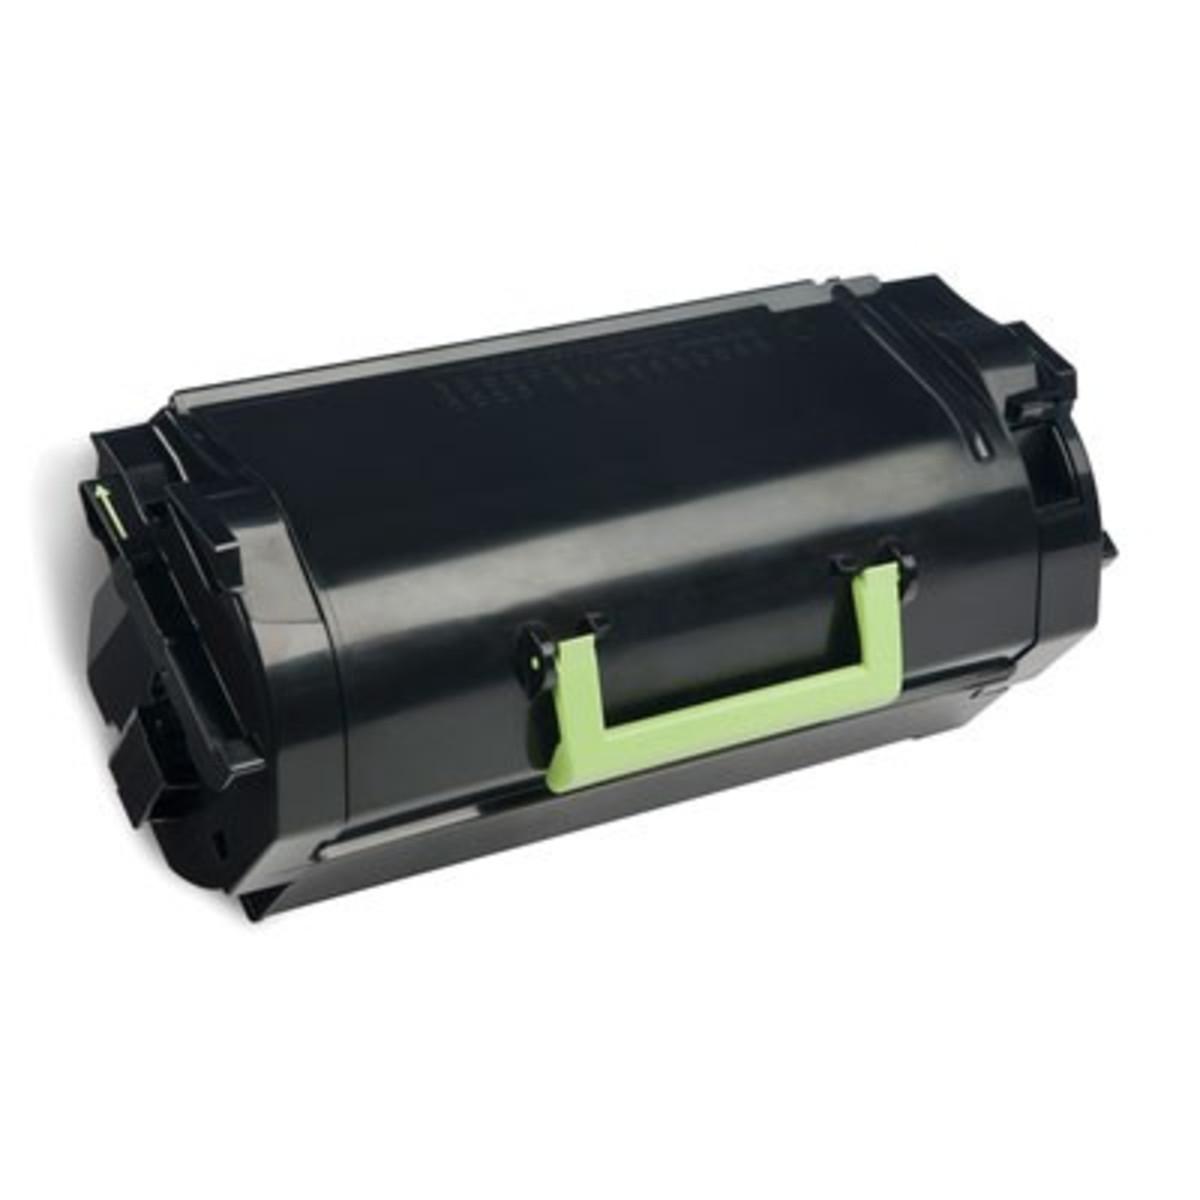 Lexmark 523 Black Toner Cartridge